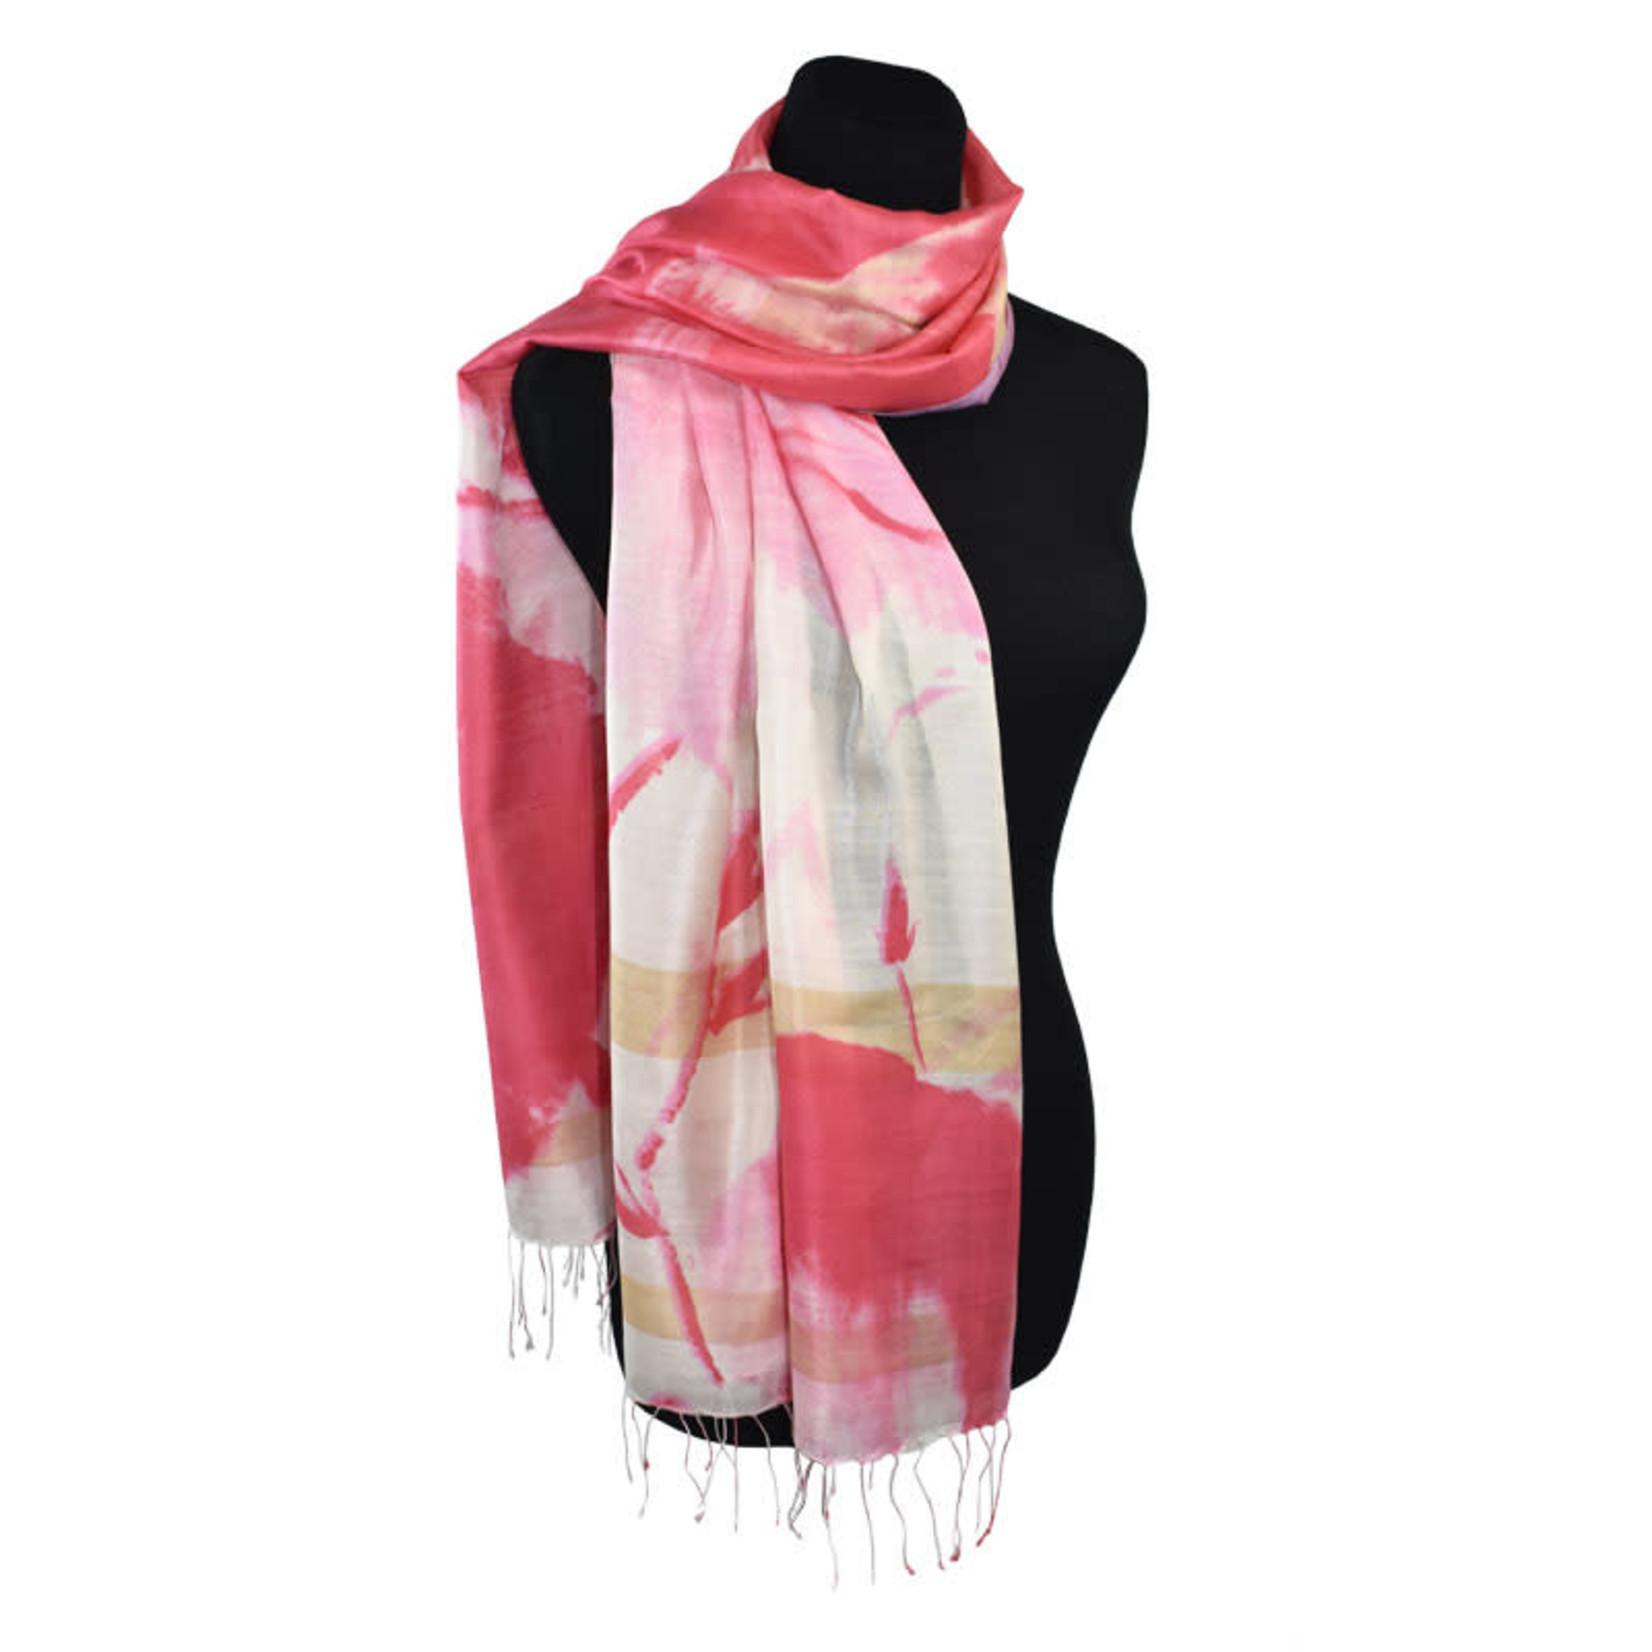 100% Handwoven Silk Japanese Brush Stroke Floral Pink/White